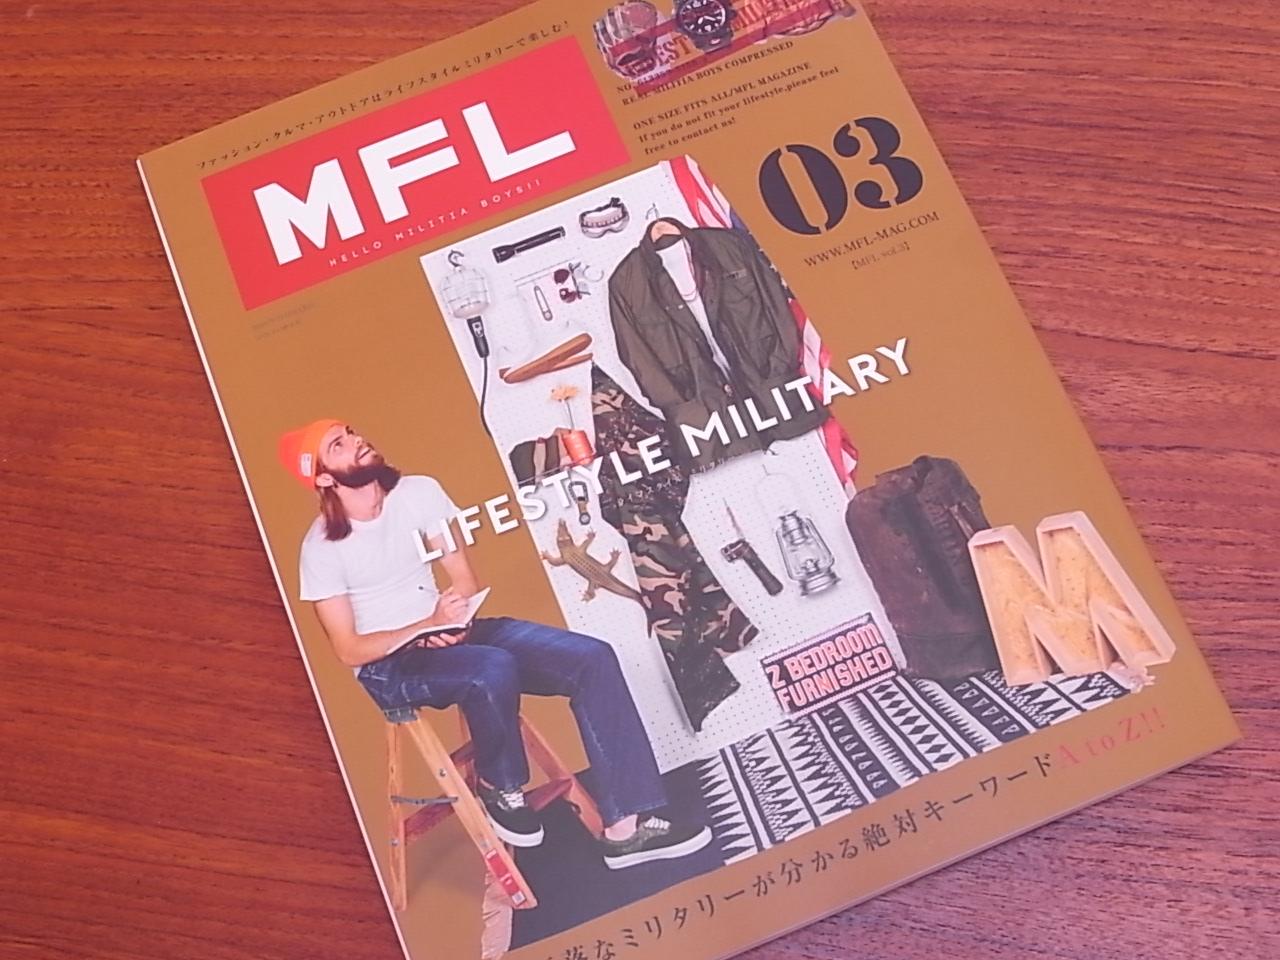 MFL No.3 ライフスタイルミリタリー 当店も紹介されています。